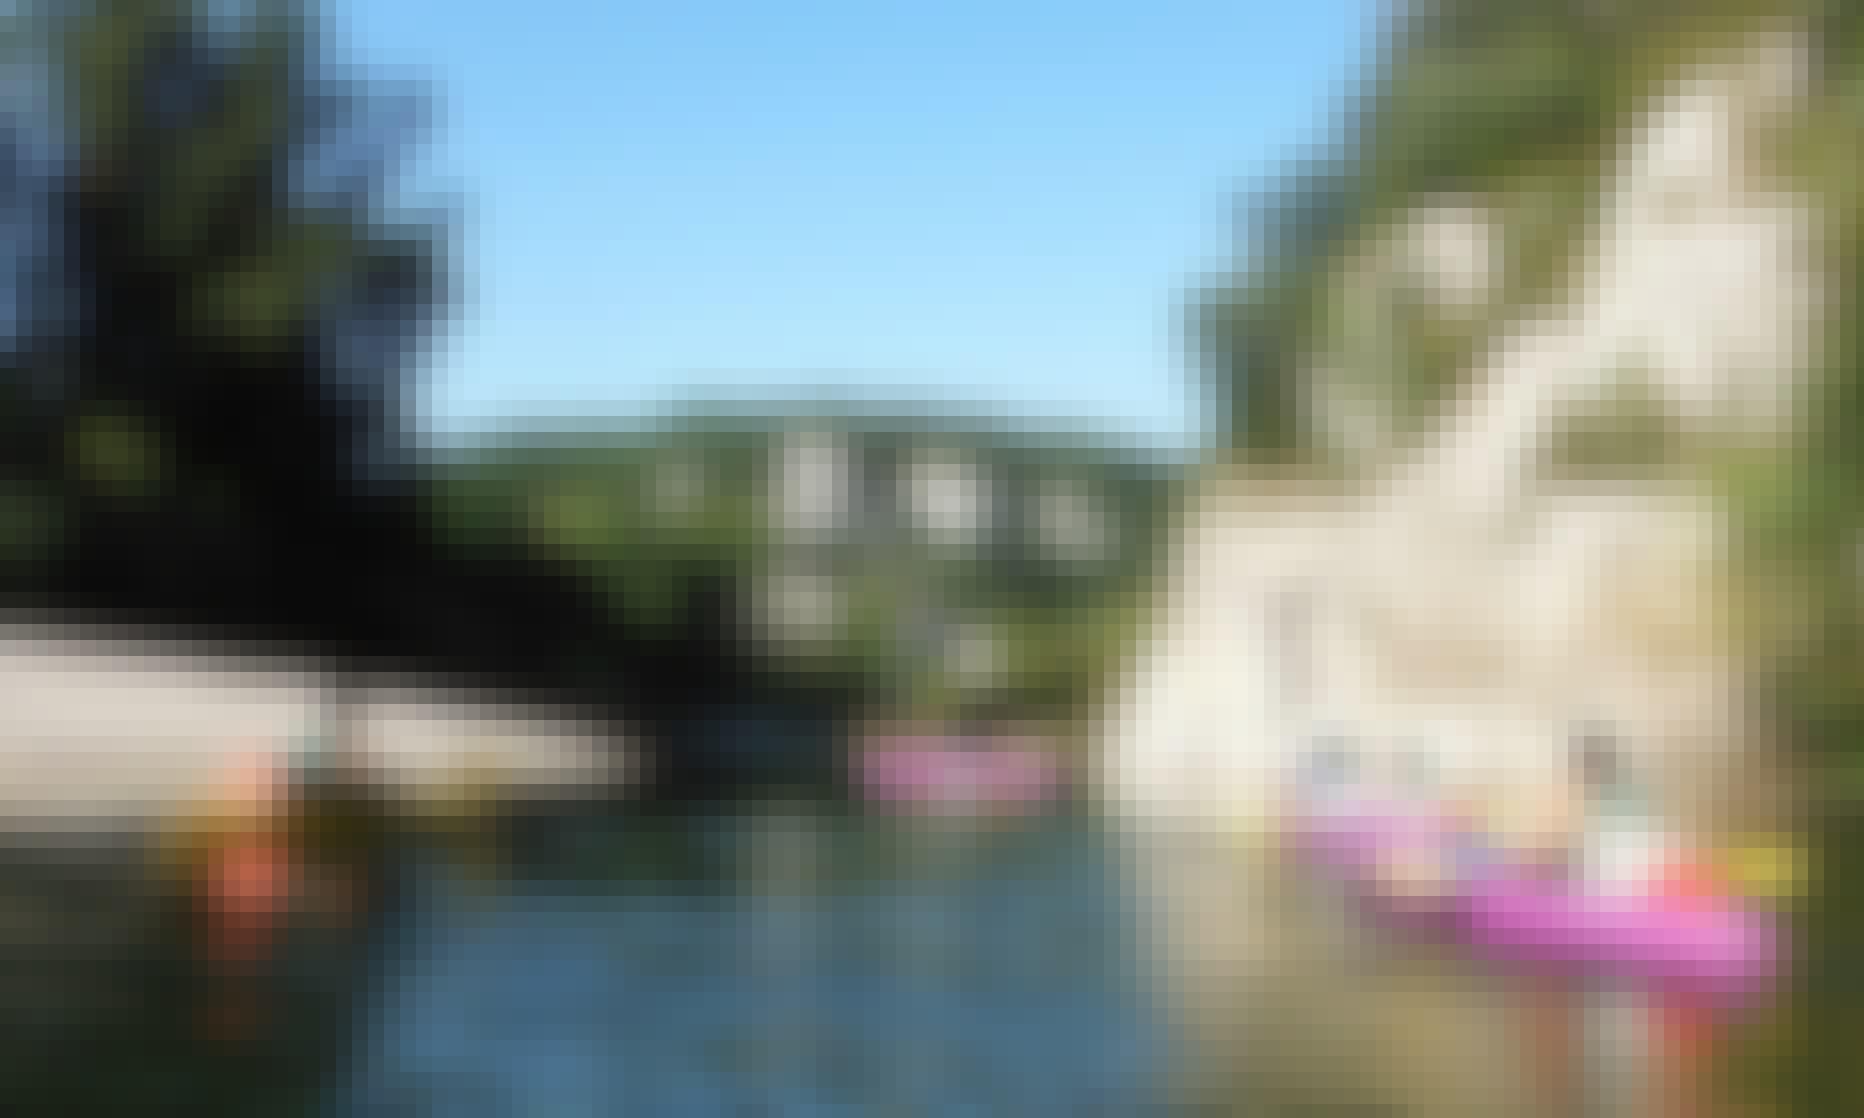 Single Kayak Tours in the Cèze River